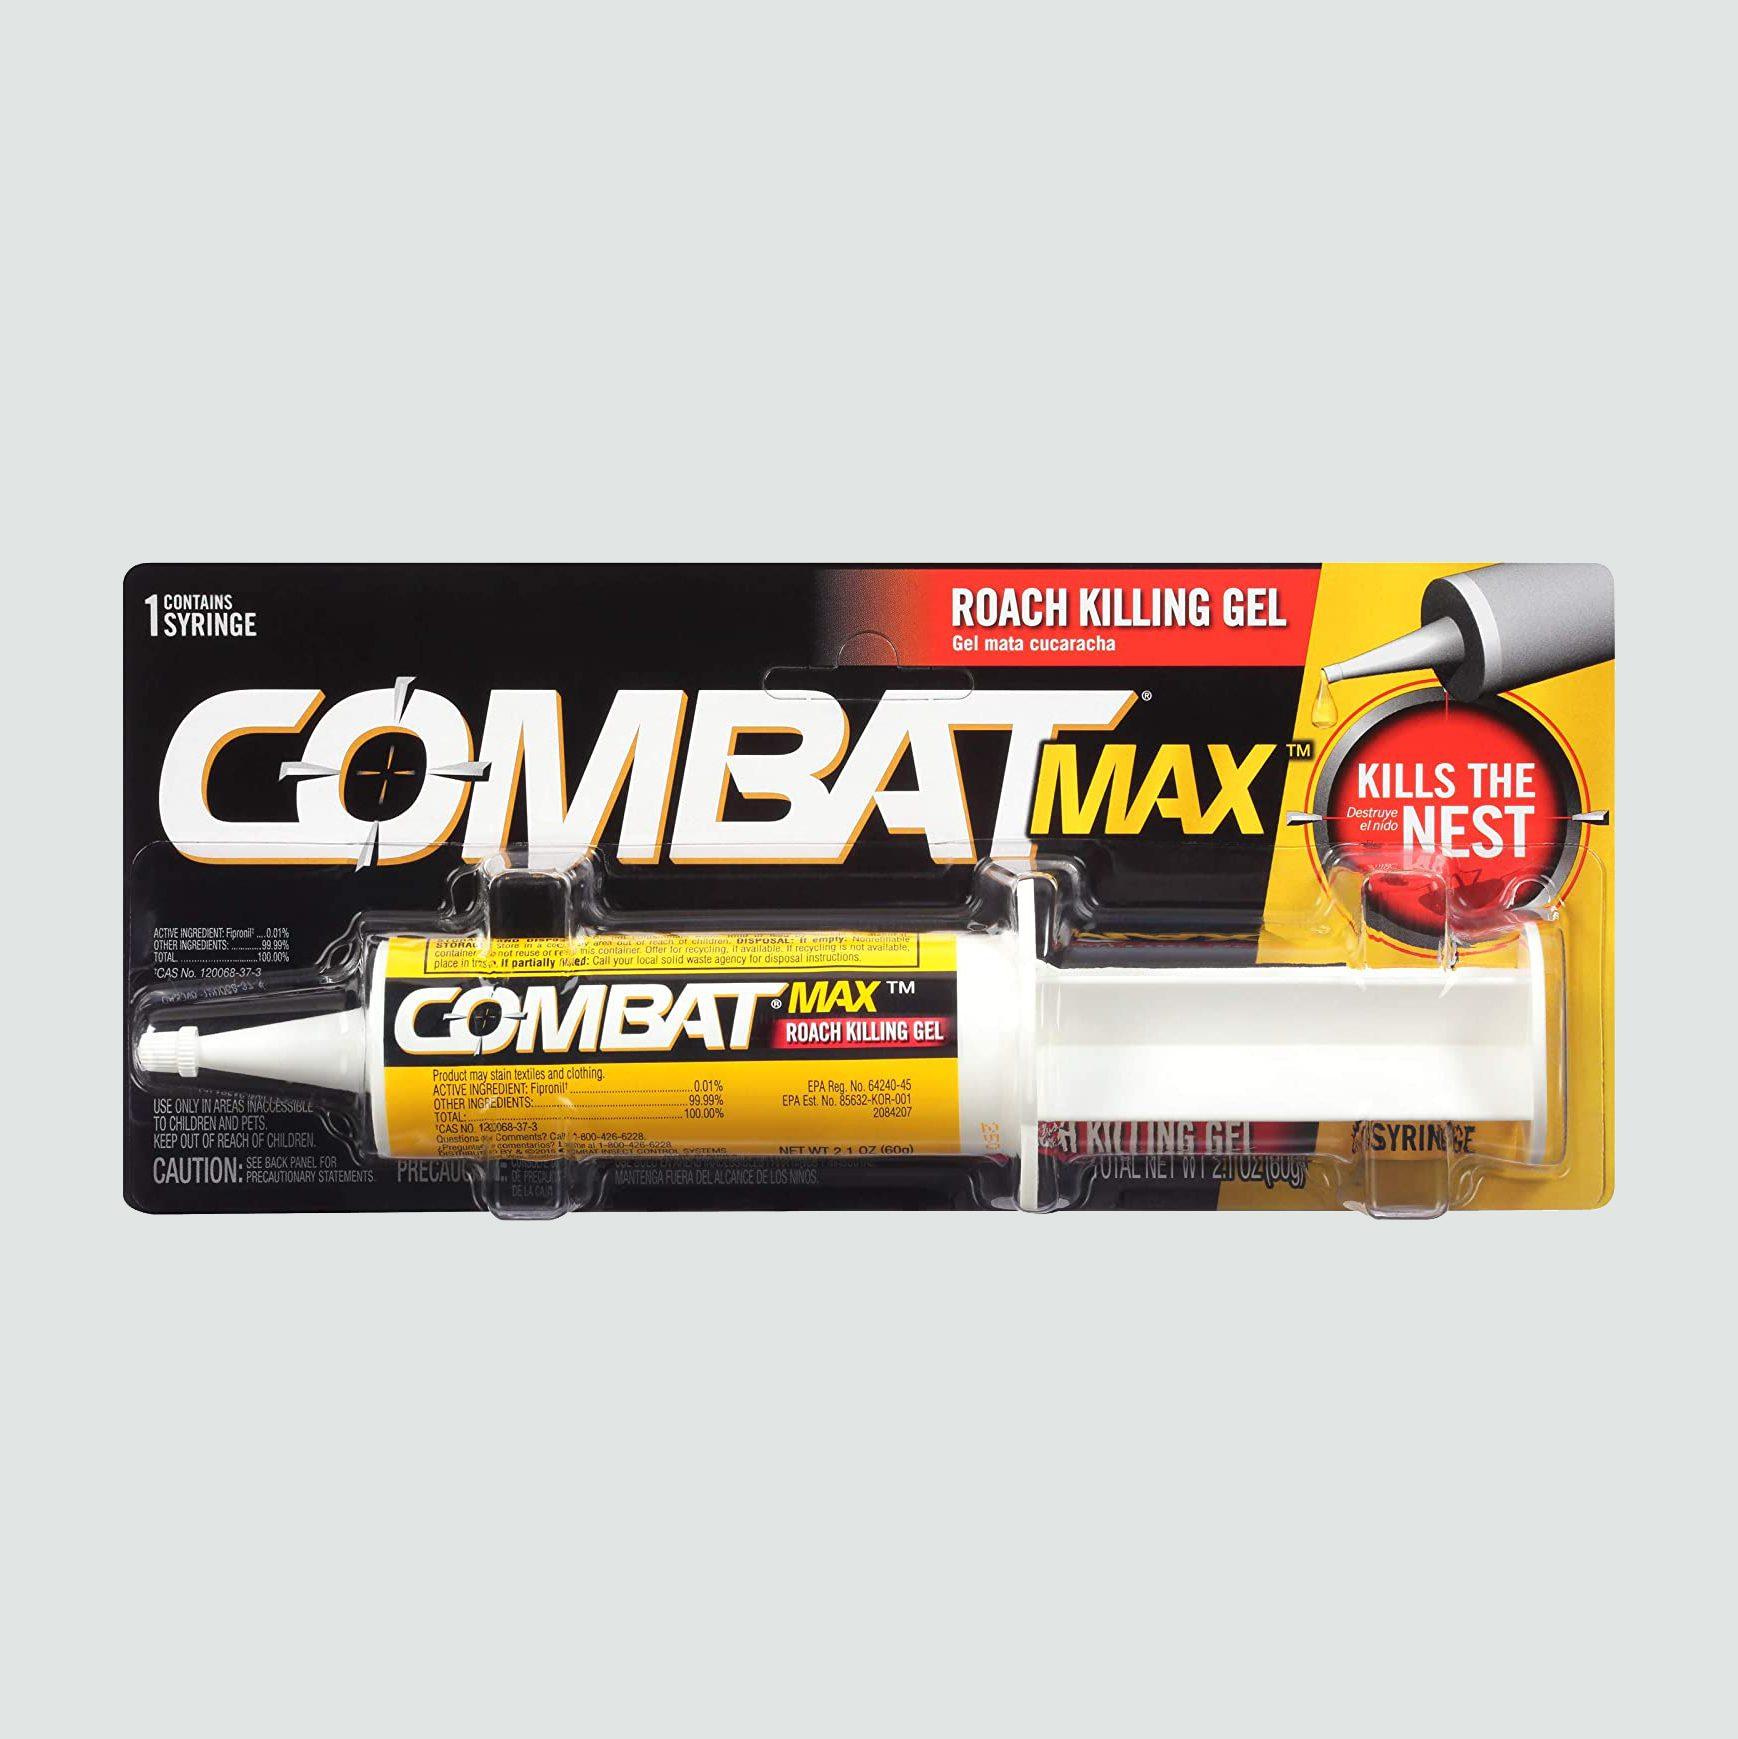 Combat Max Roach Killing Gel